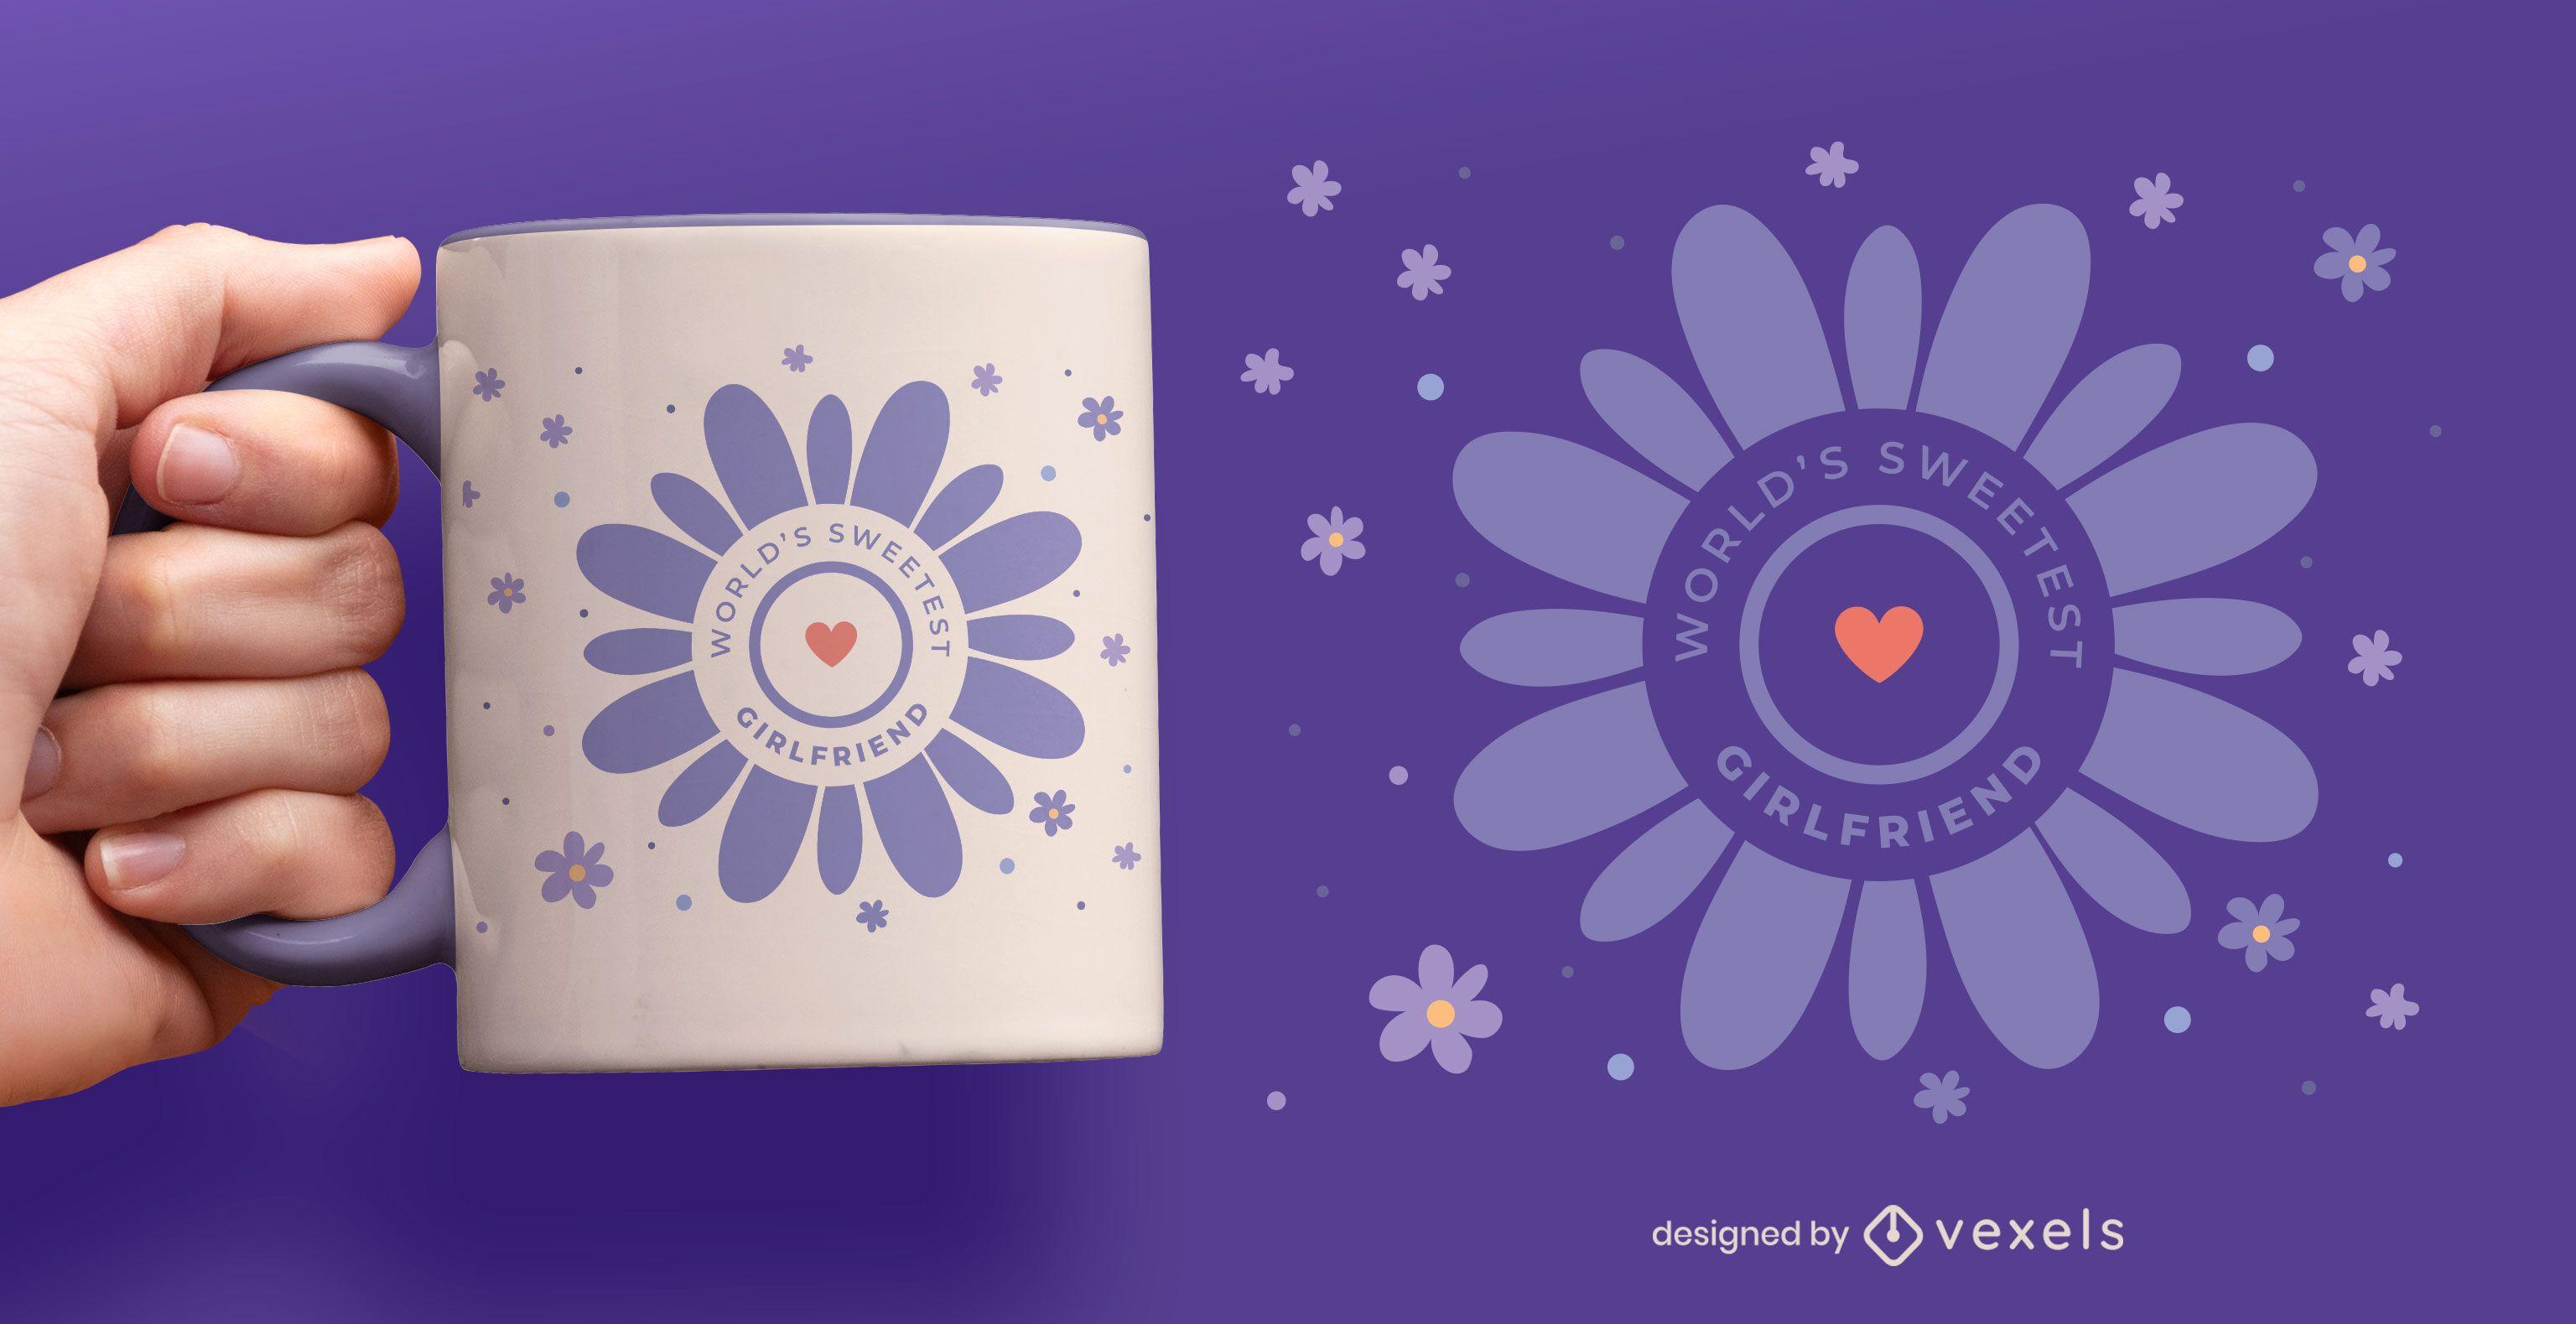 World's sweetest girlfriend mug design